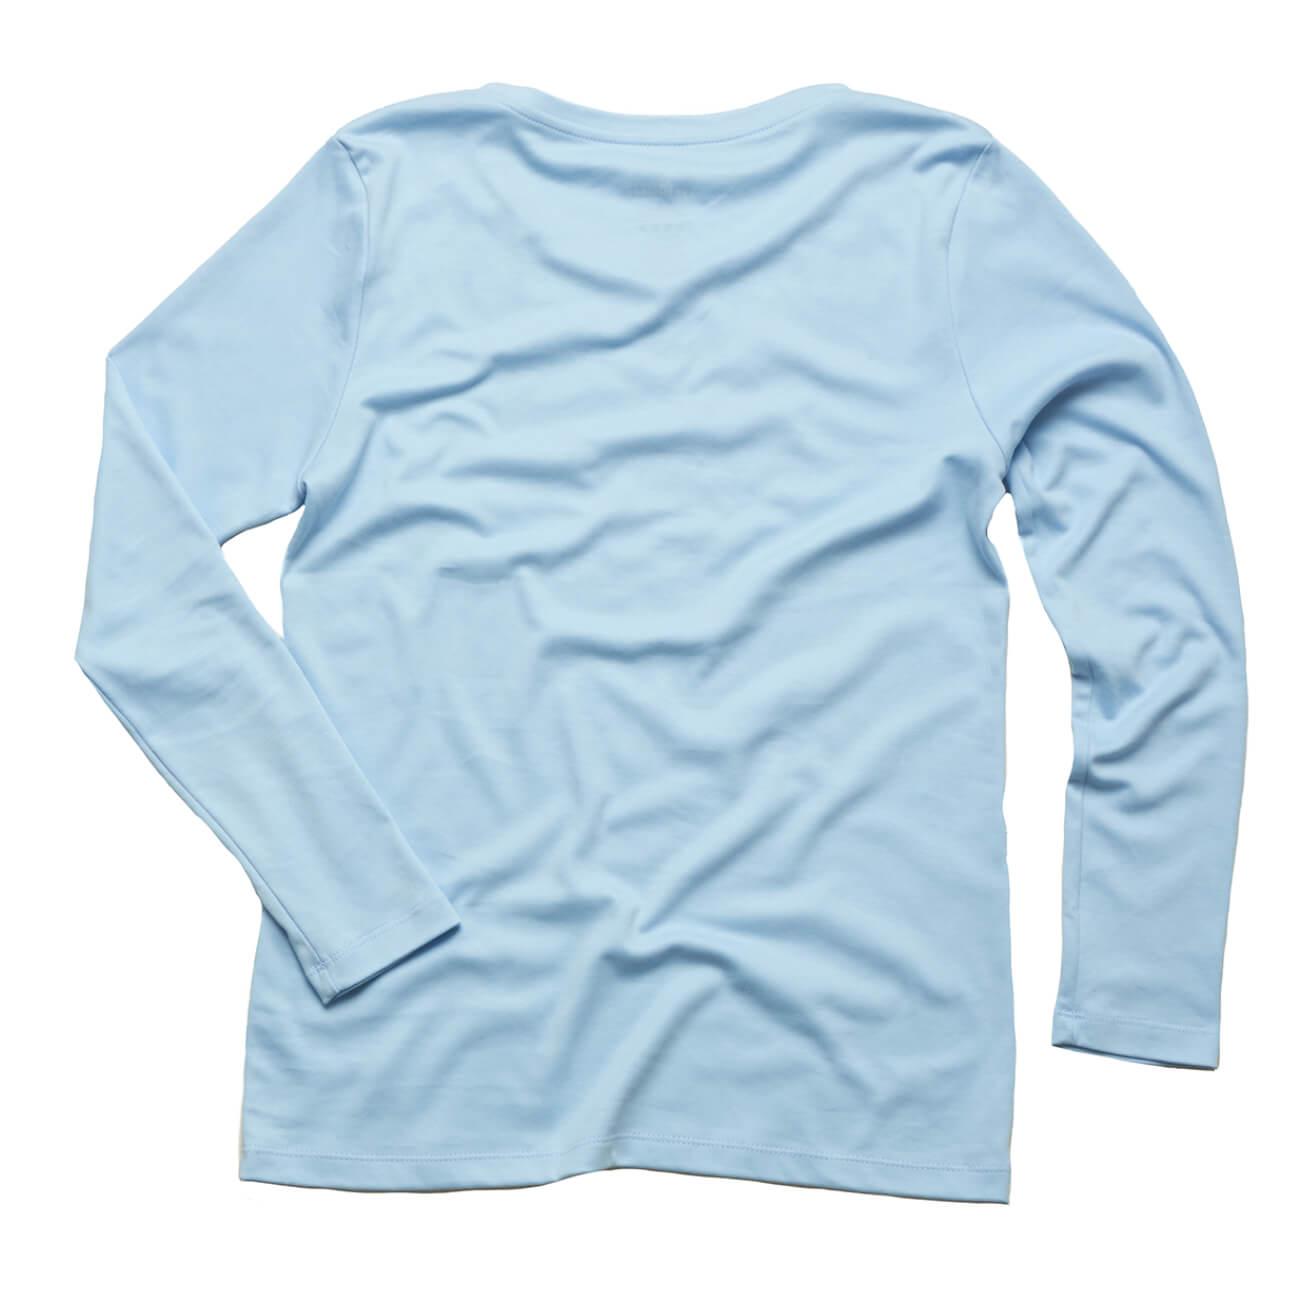 Franela basica Verticales dama manga larga azul claro espalda